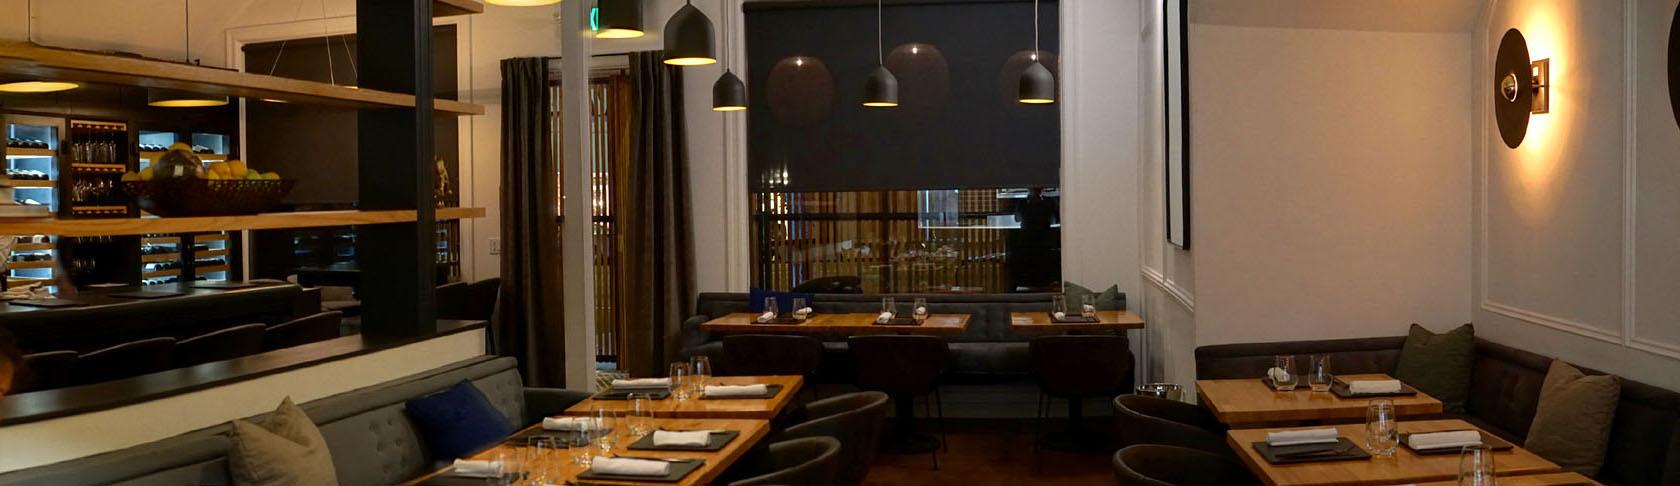 Kass Wine Bar + Restaurant Interior